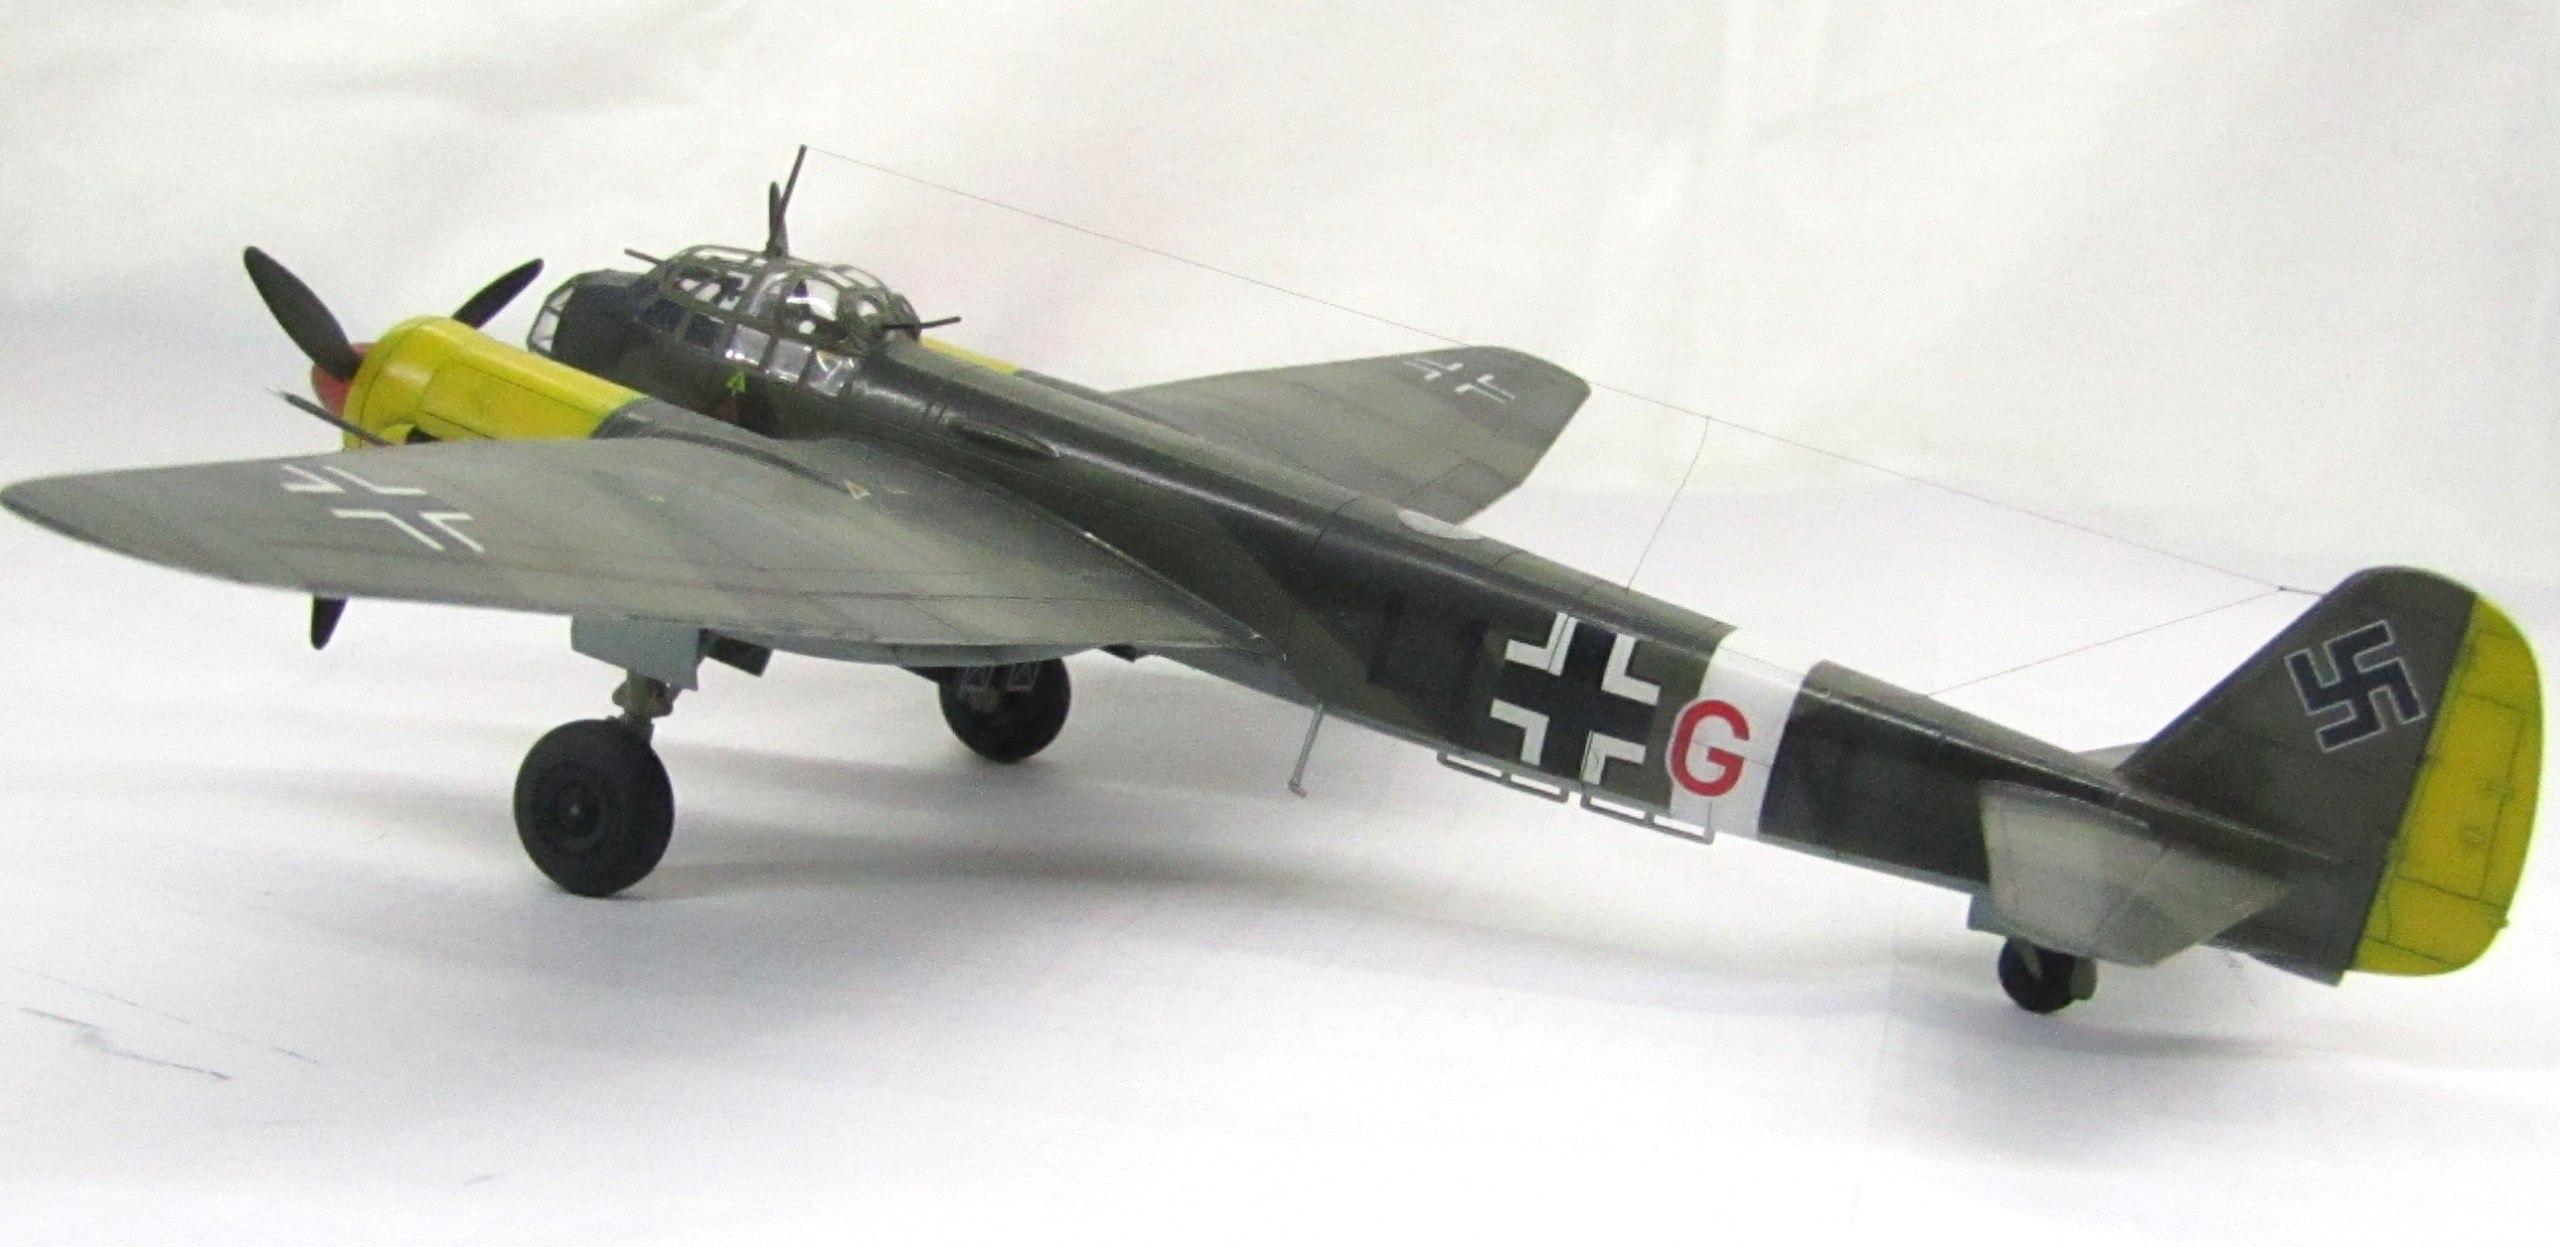 Ju-88 A-4 1/72 (Звезда) Bhy8s5LzT0U